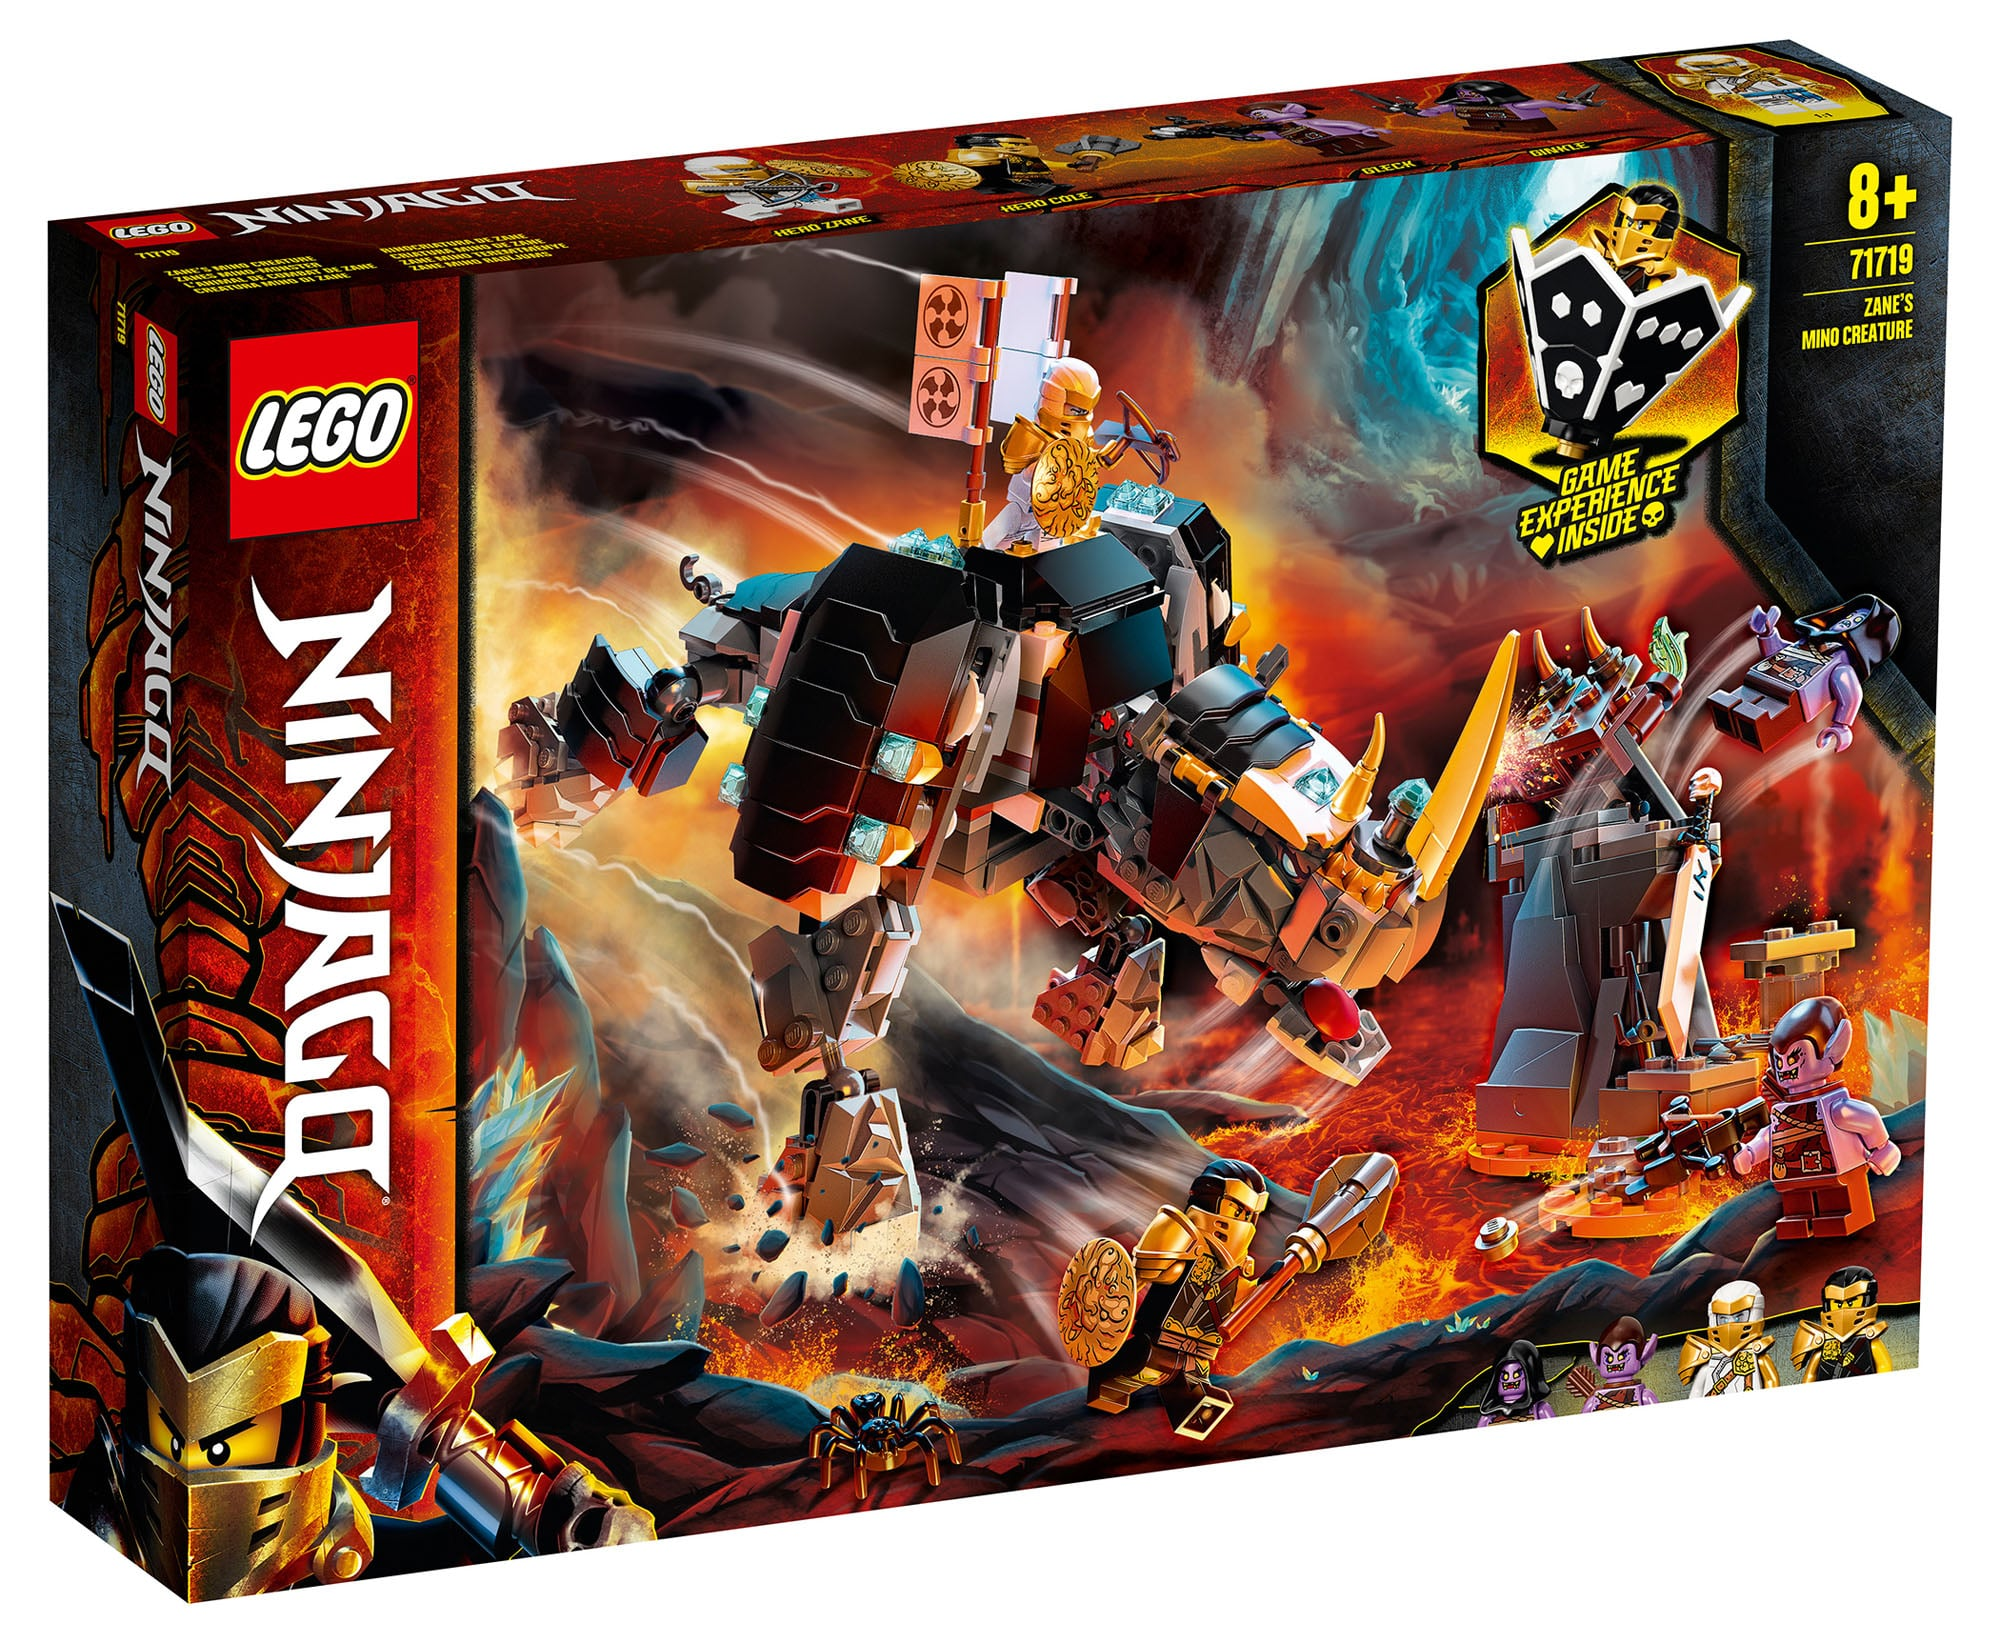 LEGO Ninjago 71719 Zanes Mino-Monster